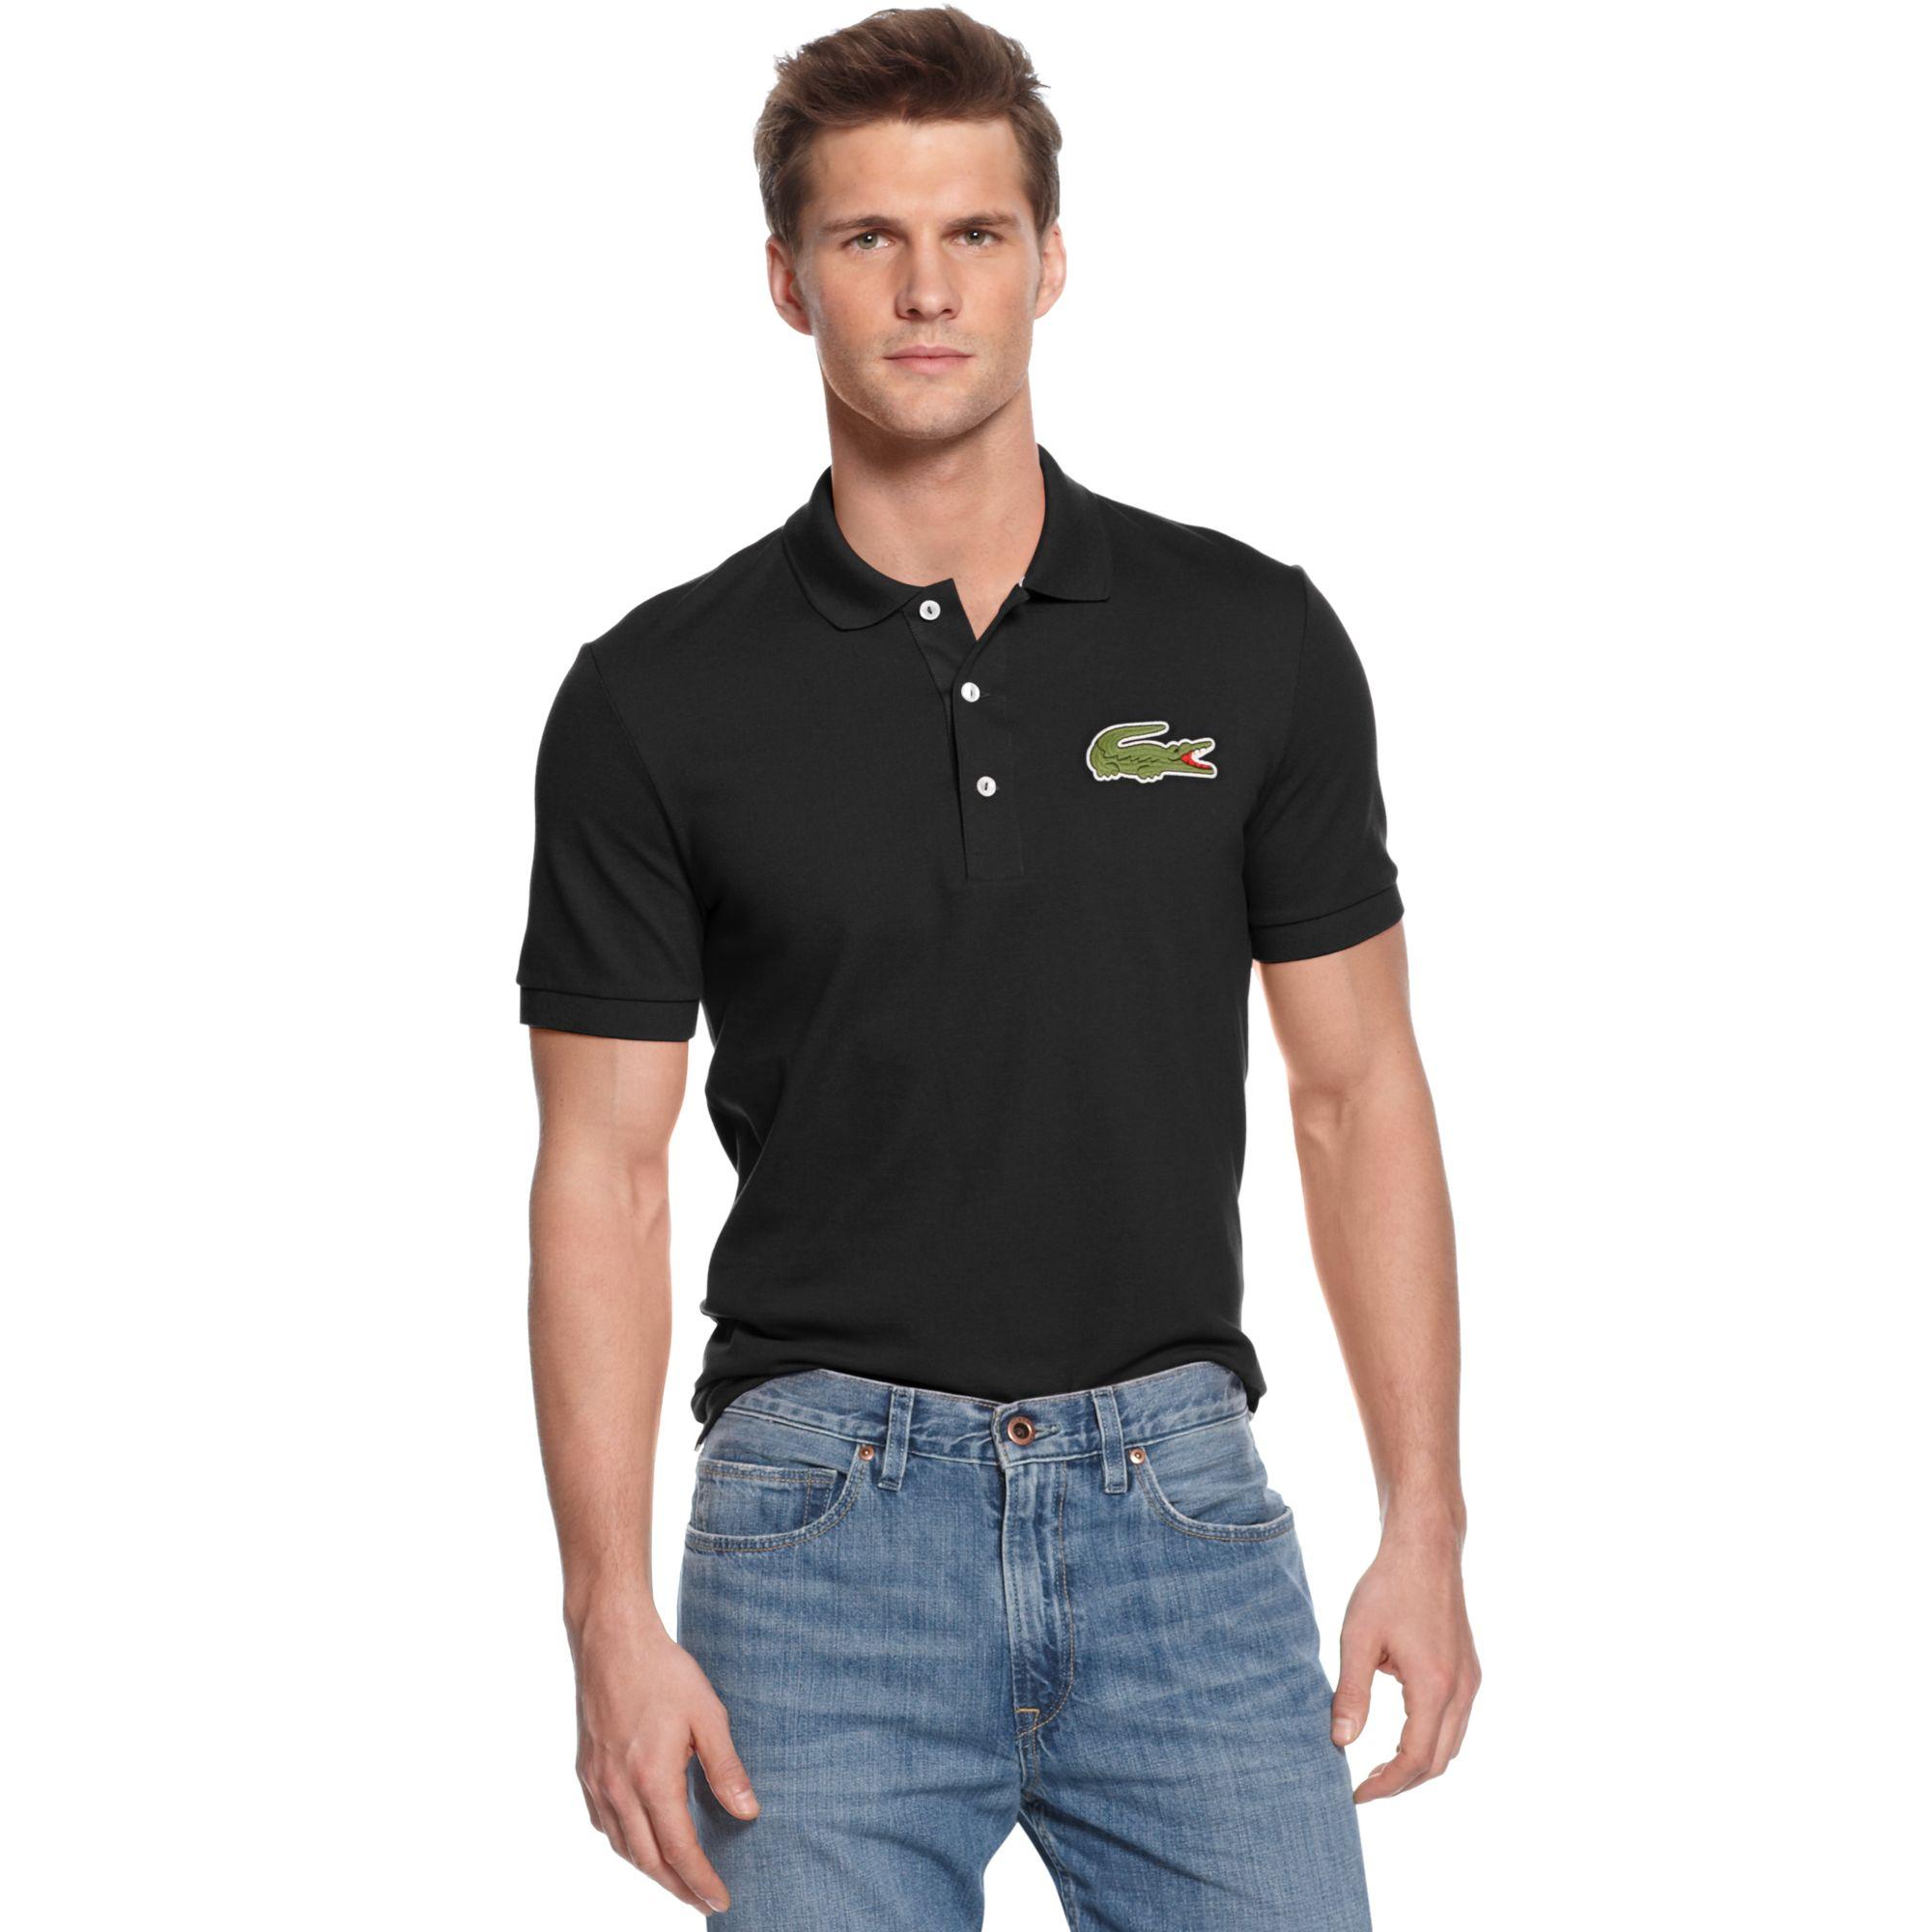 94c0927f1247 Lyst - Lacoste Oversized Crocodile Pique Polo in Black for Men